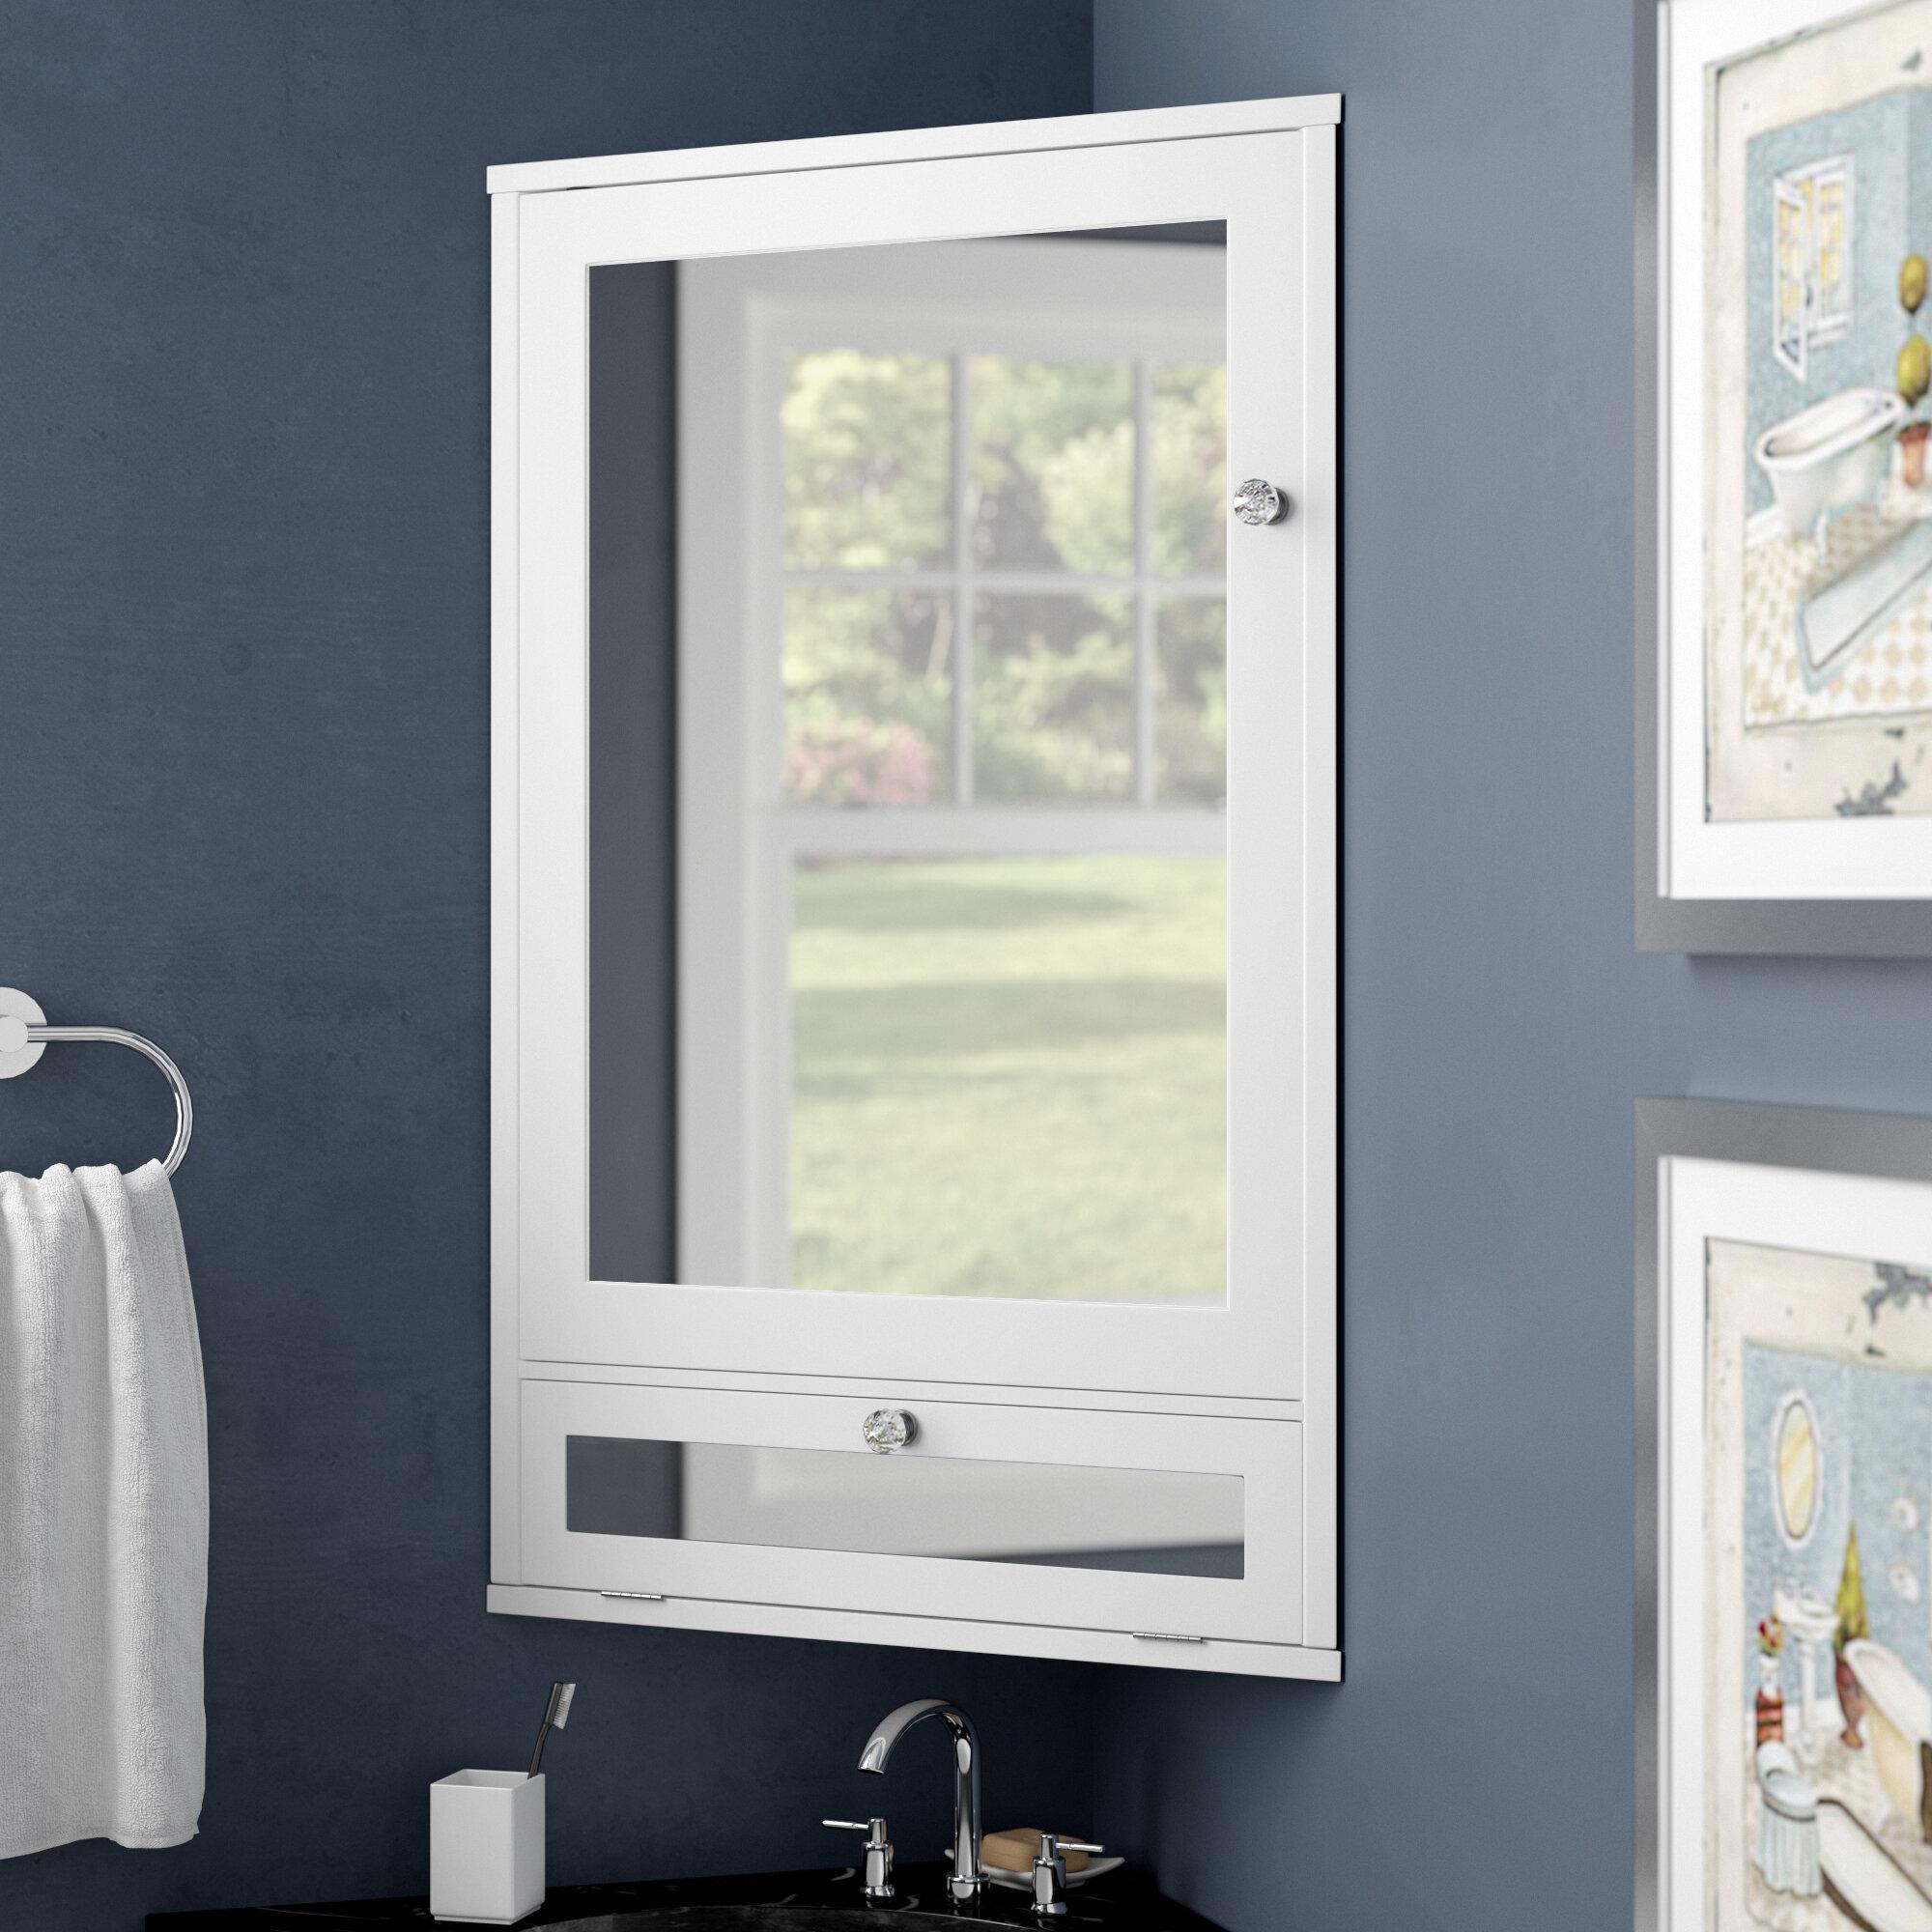 Red Barrel Studio Lipson 22 W X 34 H Corner Mount Medicine Cabinet Reviews Wayfair